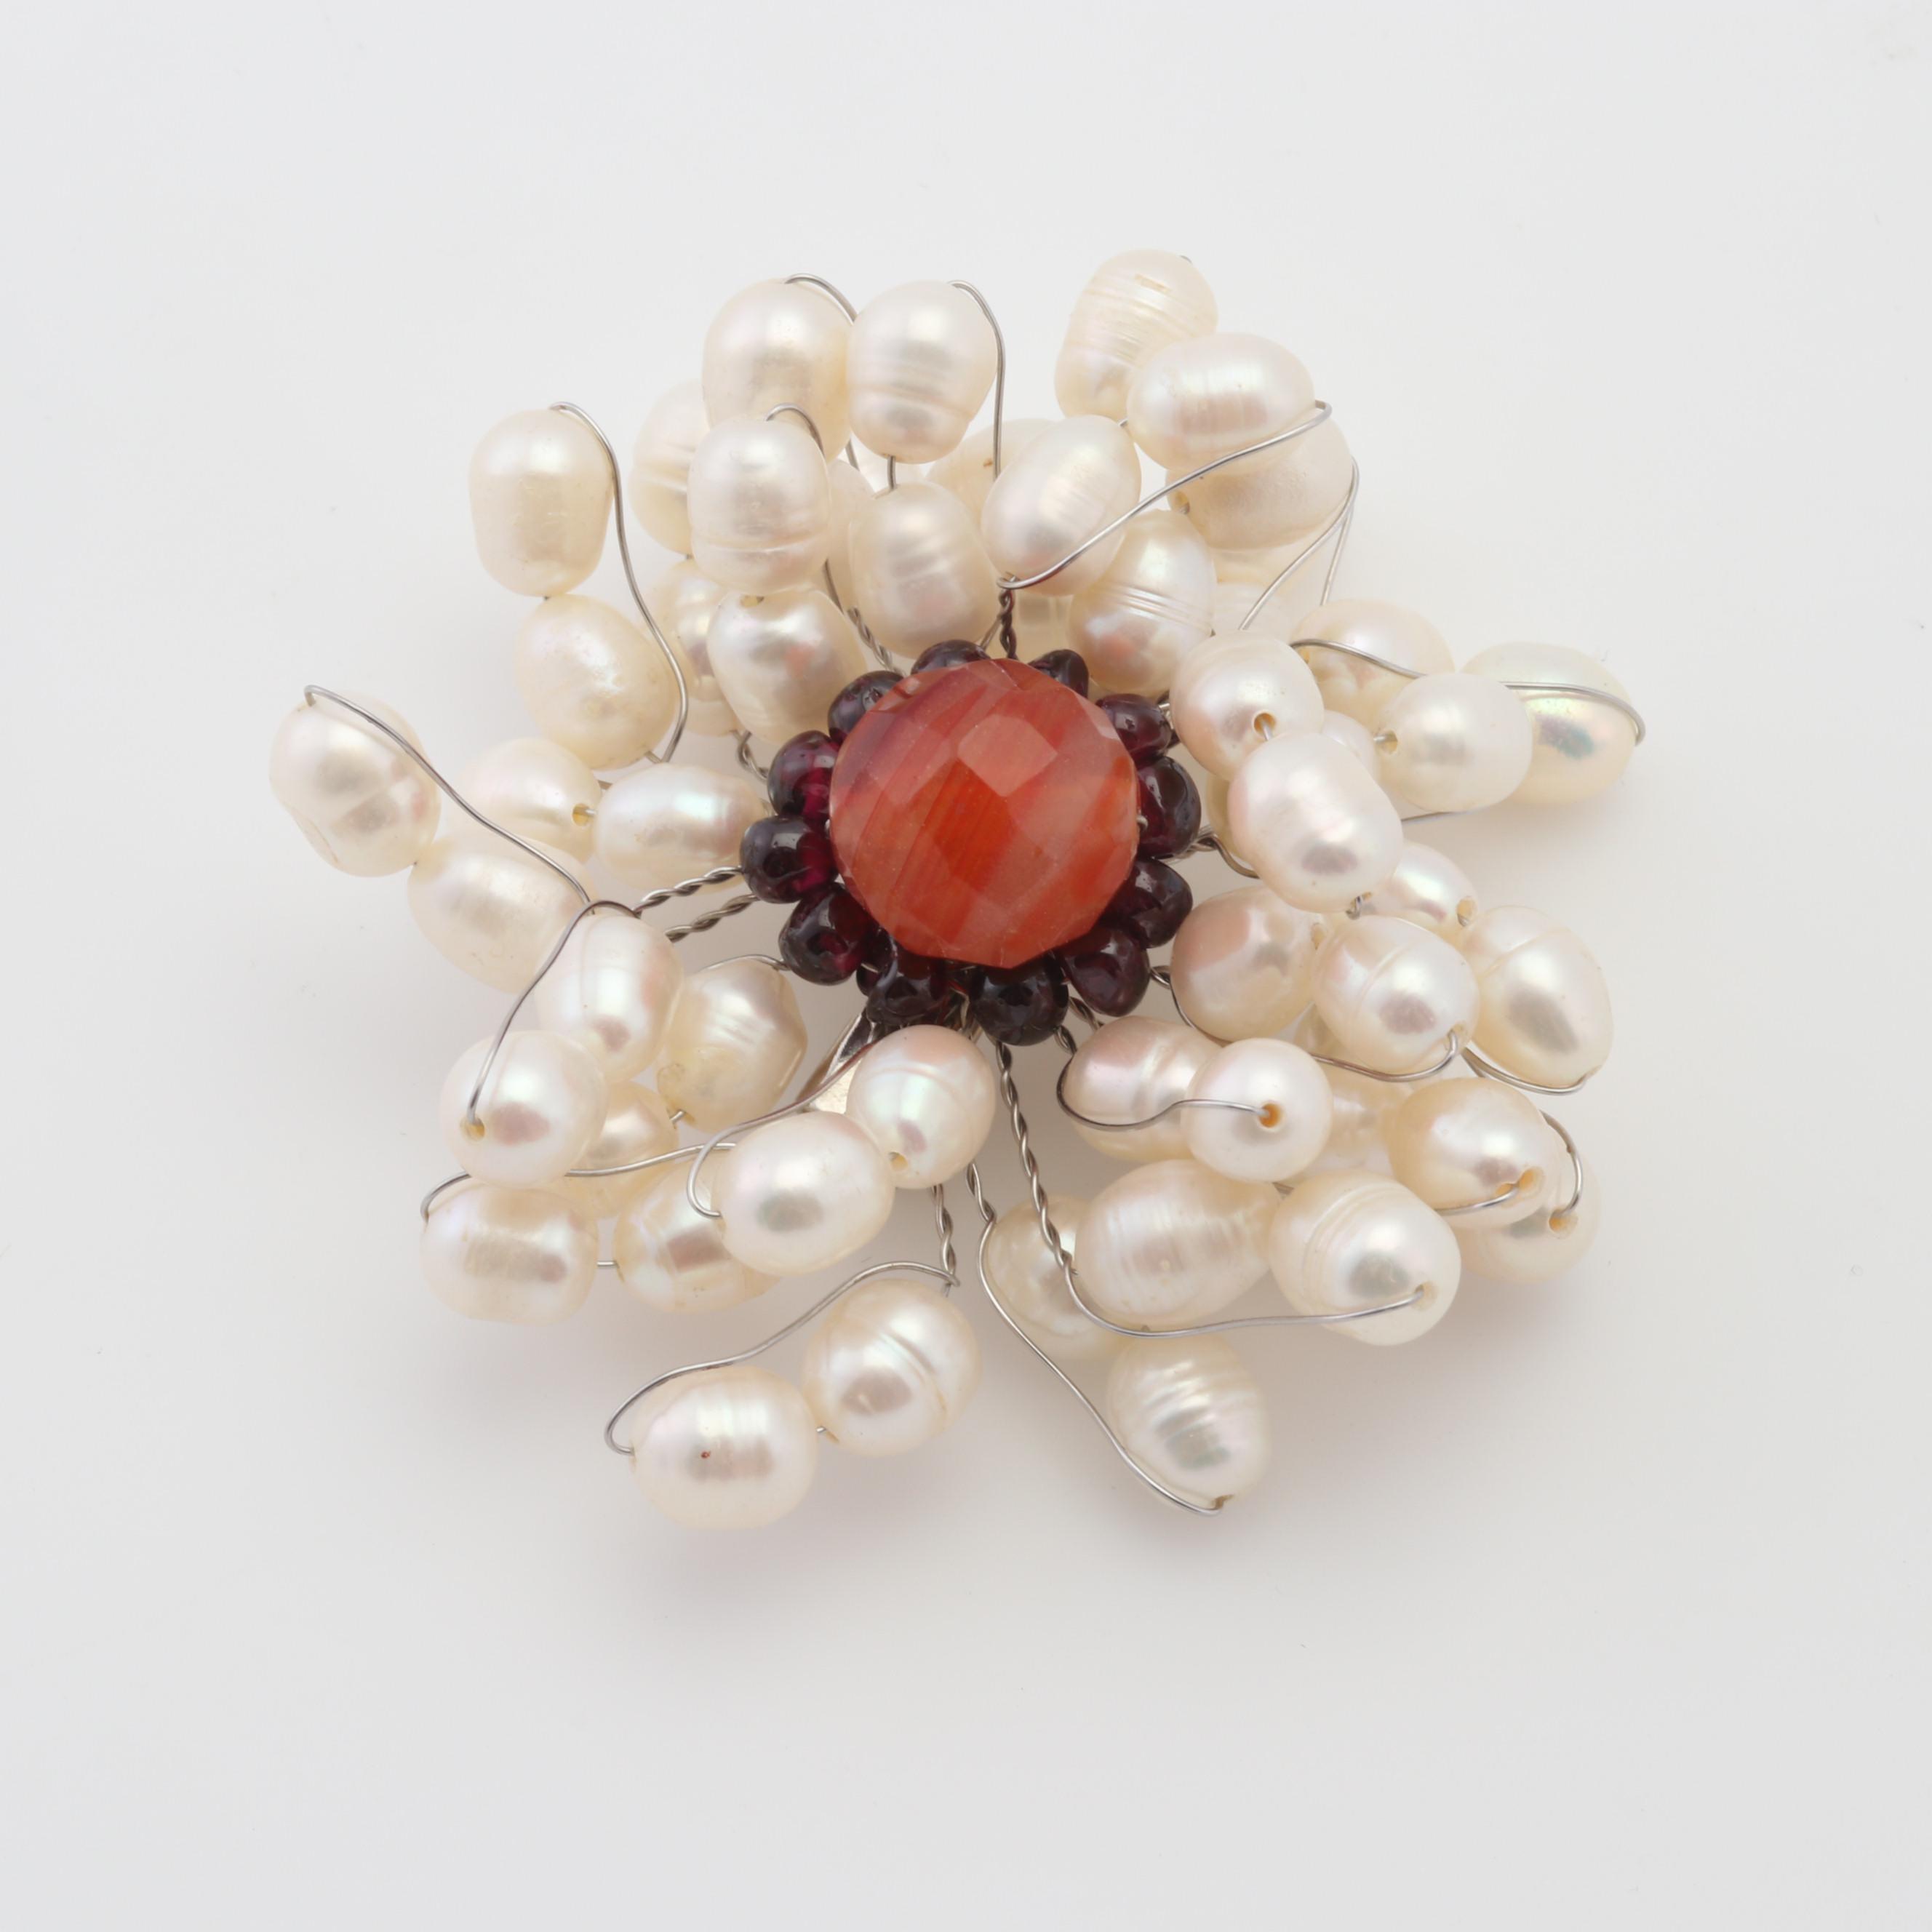 Fresh Water Cultured Baroque Pearl Brooch with Rhodolite Garnet and Orange Bead